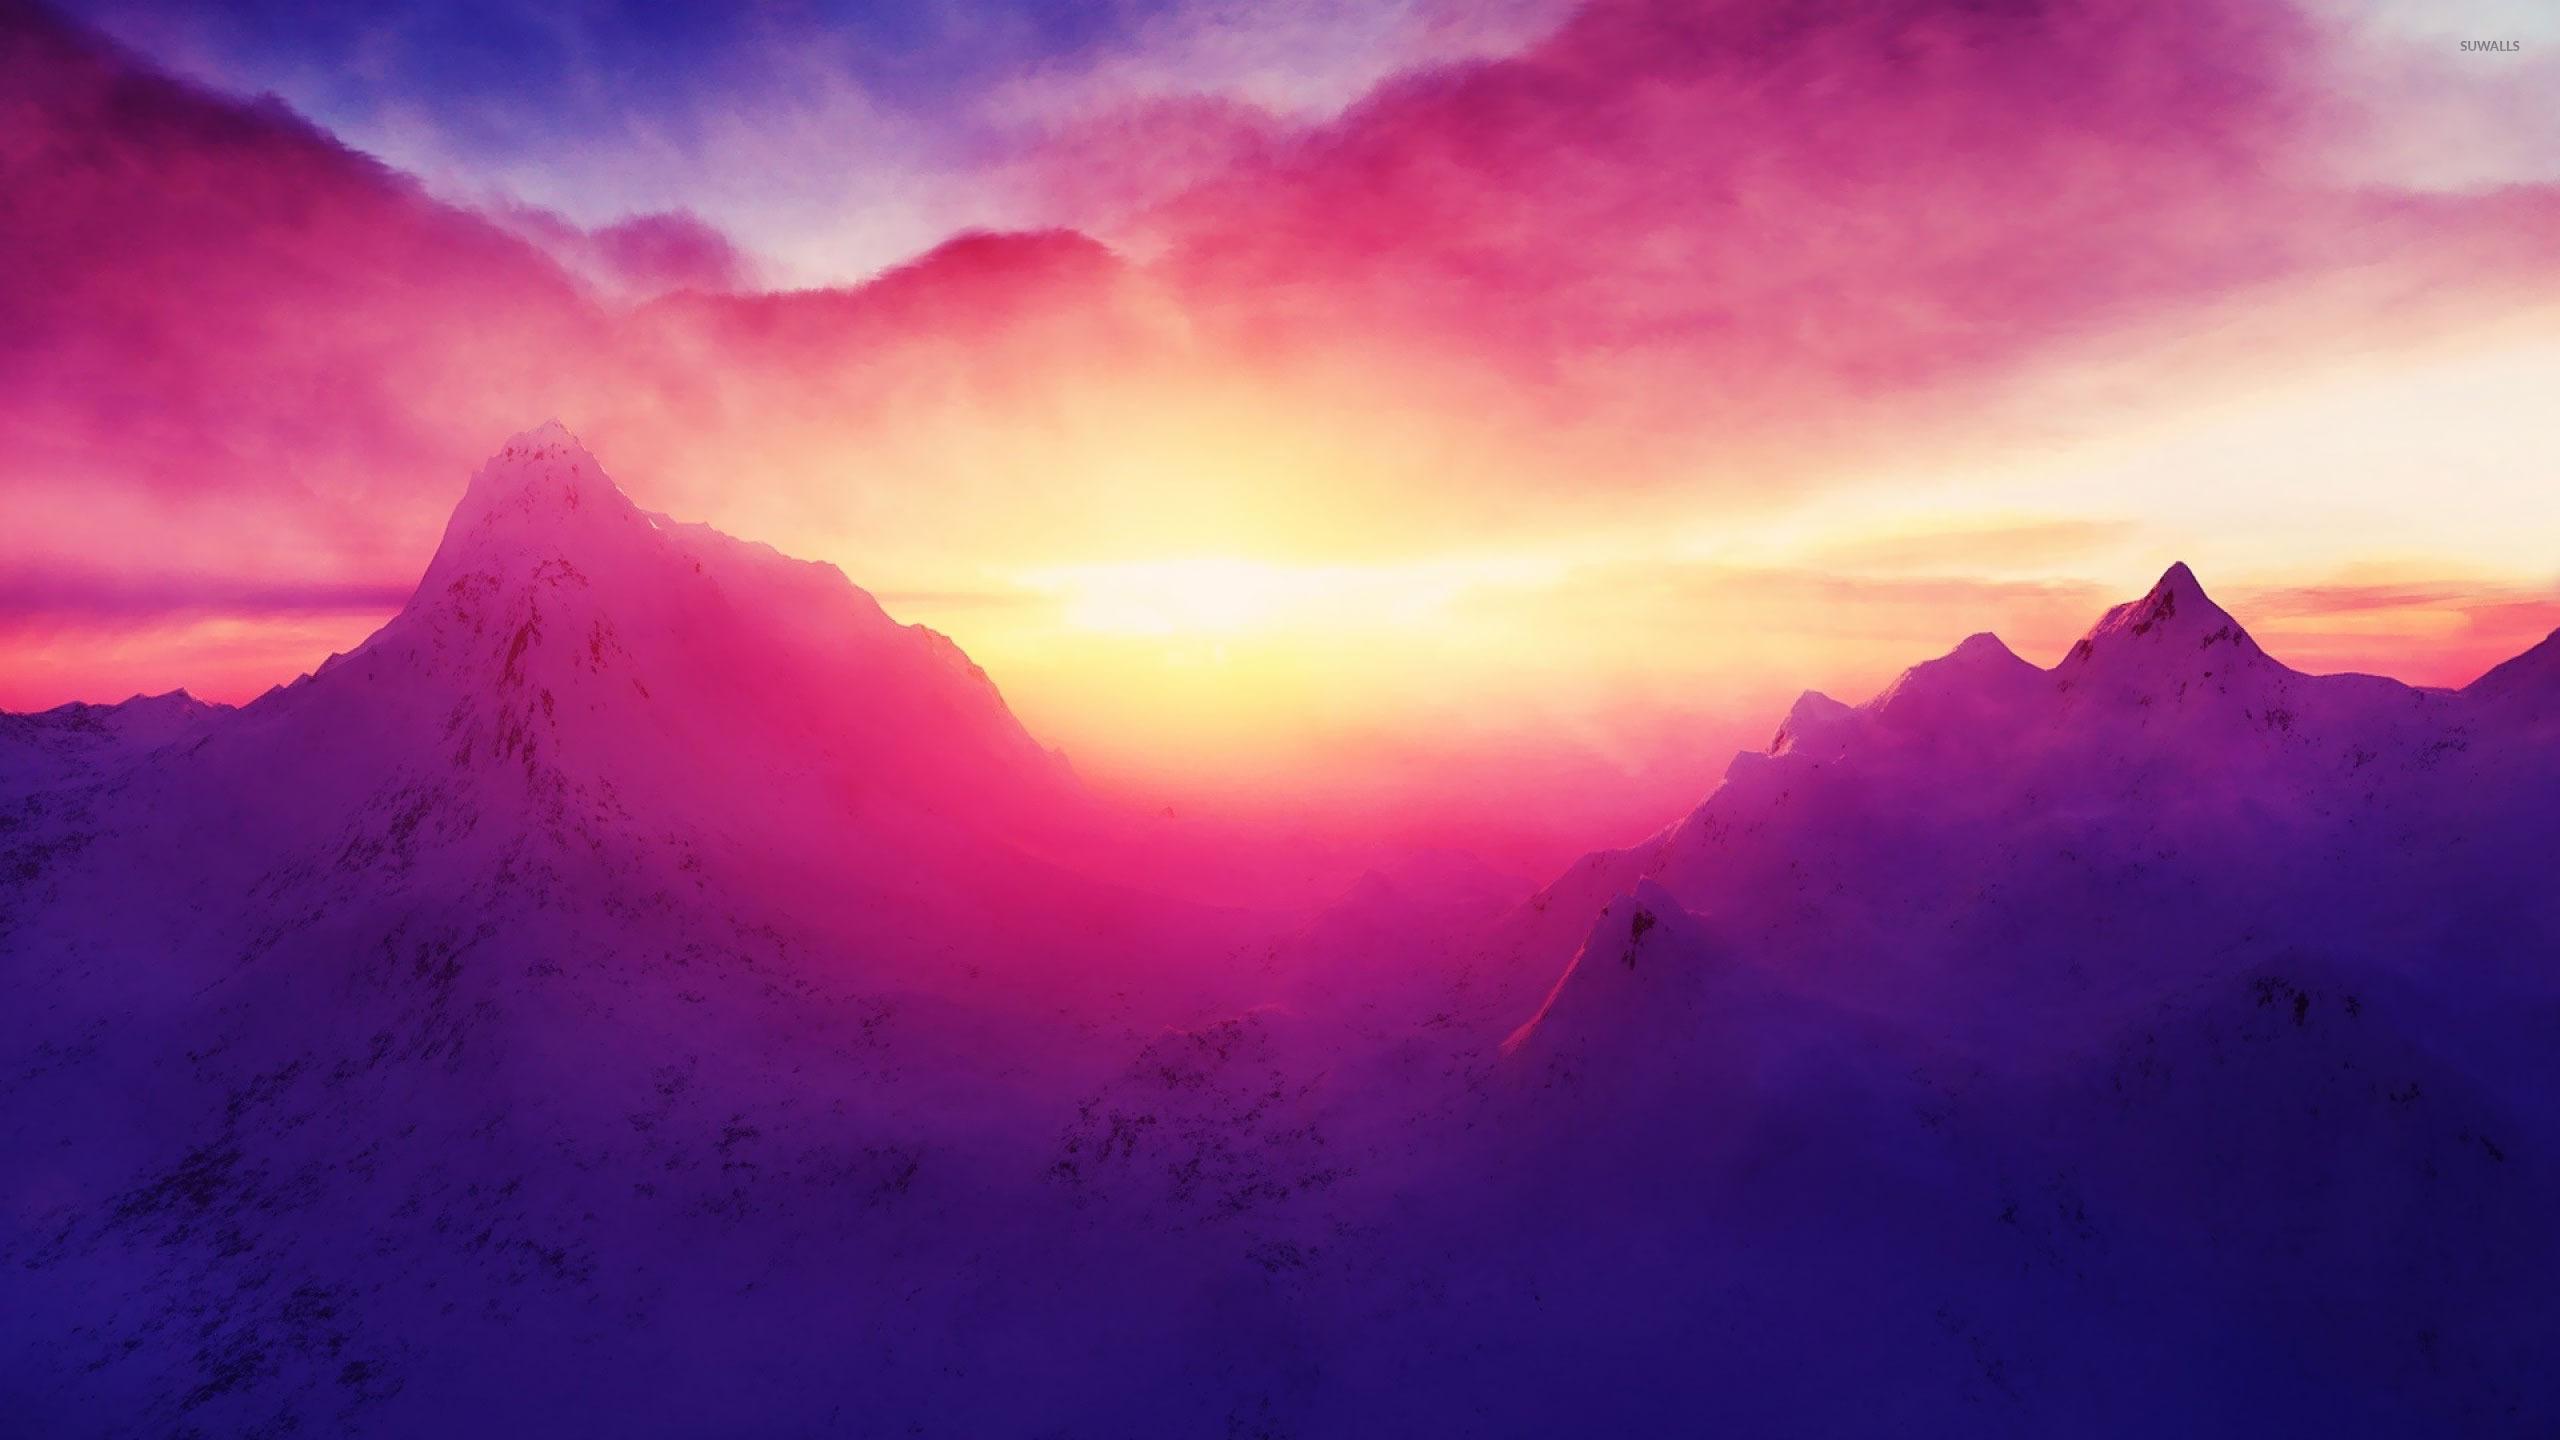 Best Wallpaper Mountain Sunrise - mountain-sunrise-18614-2560x1440  Picture_752793.jpg